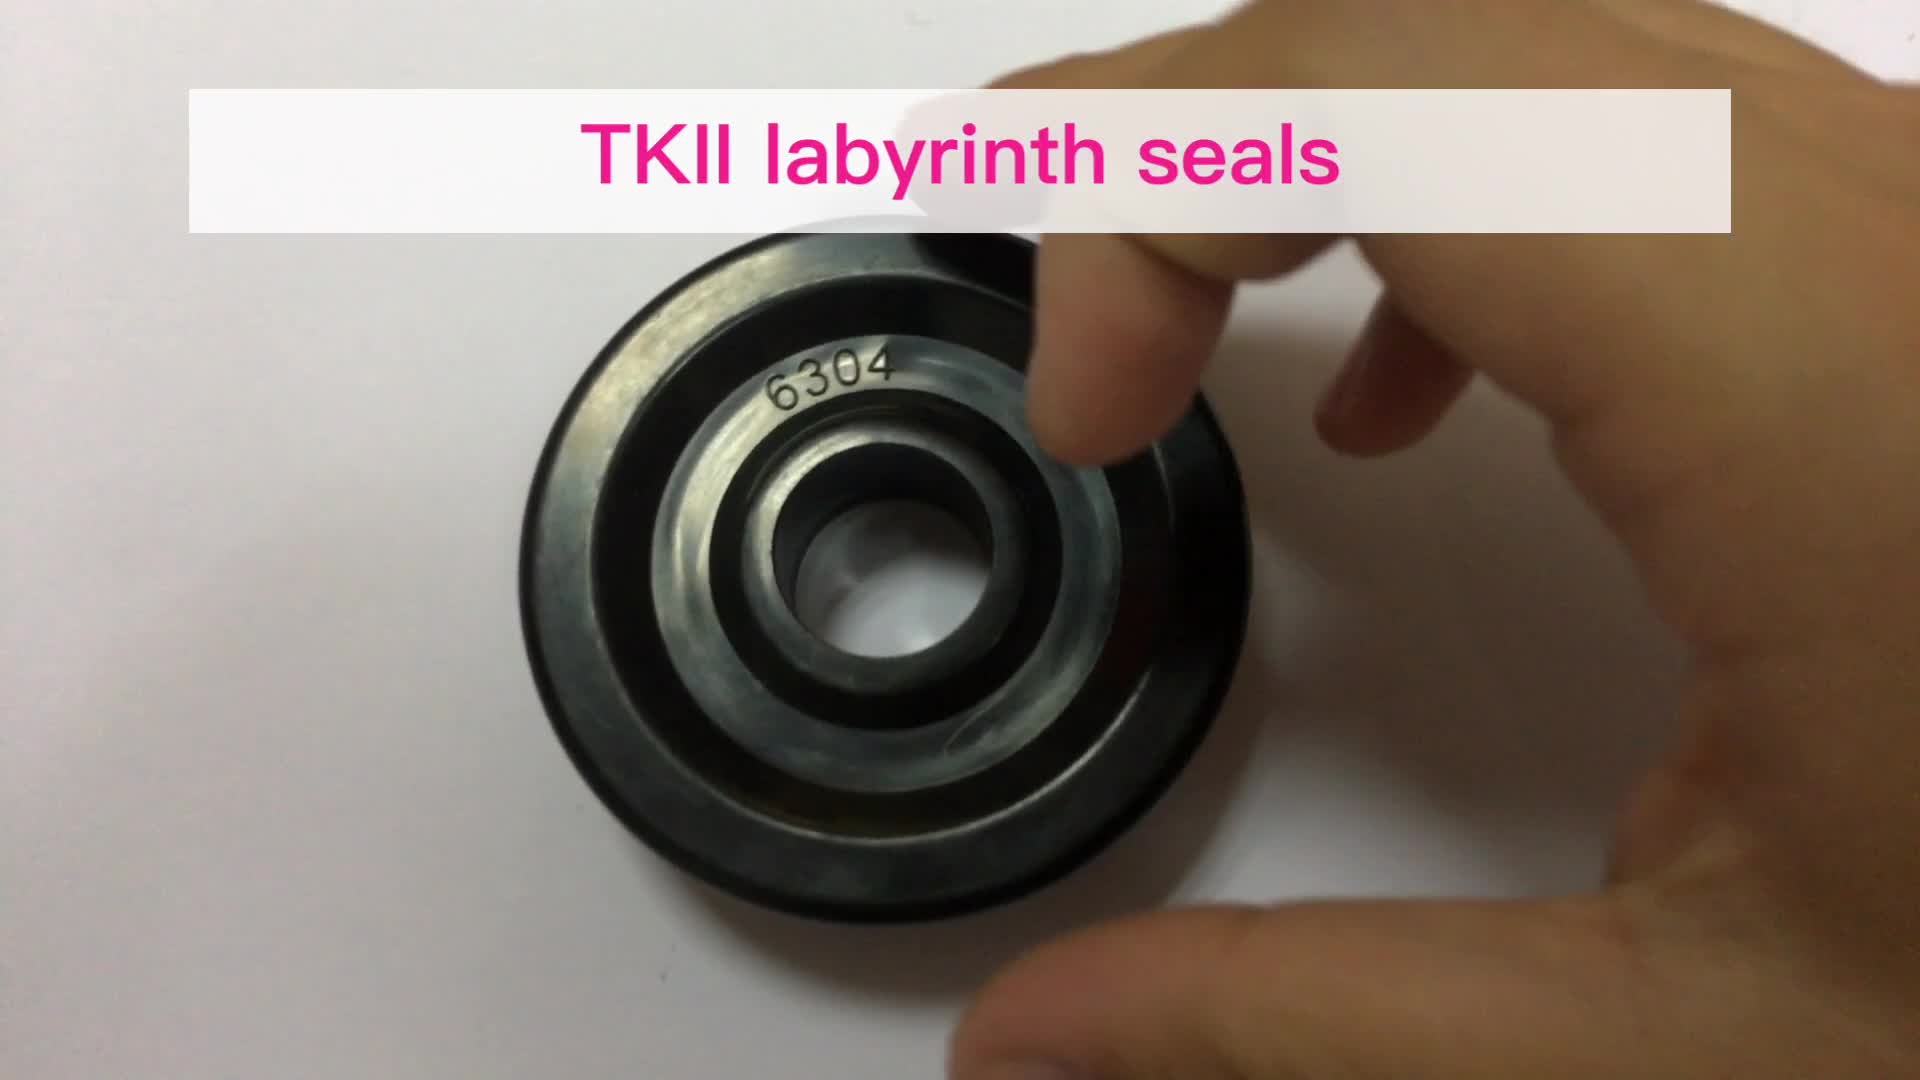 injection molding plastic TK2 labyrinth seal bearing seal